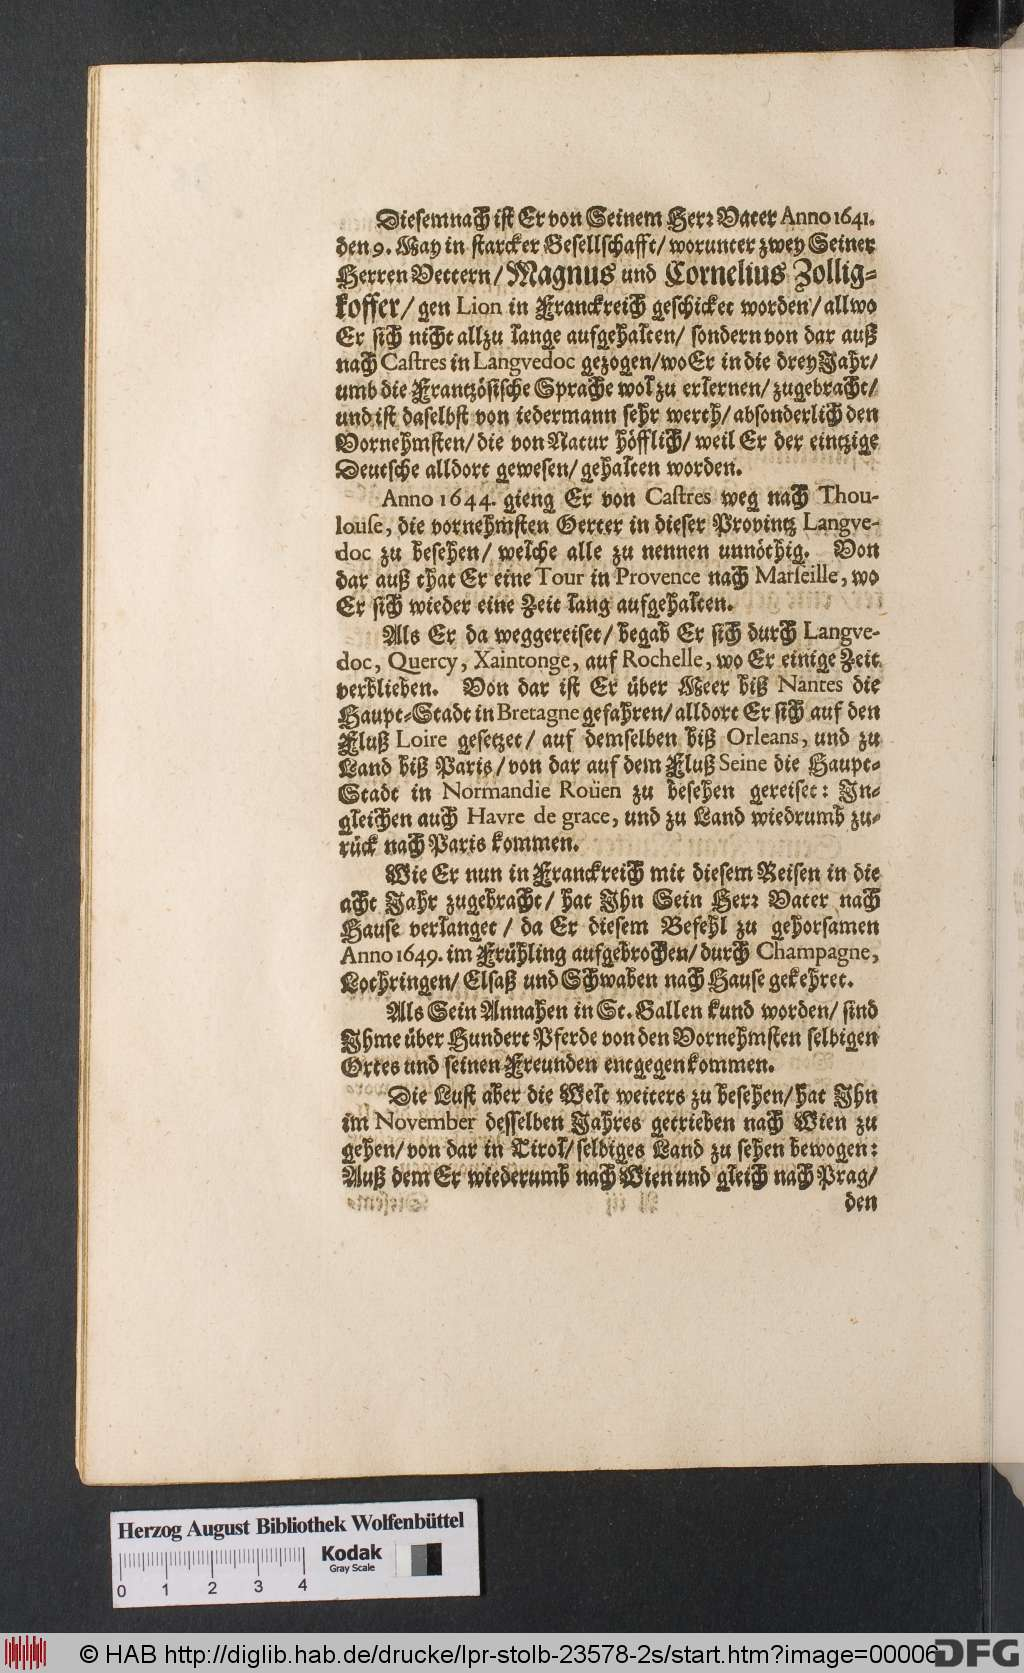 http://diglib.hab.de/drucke/lpr-stolb-23578-2s/00006.jpg